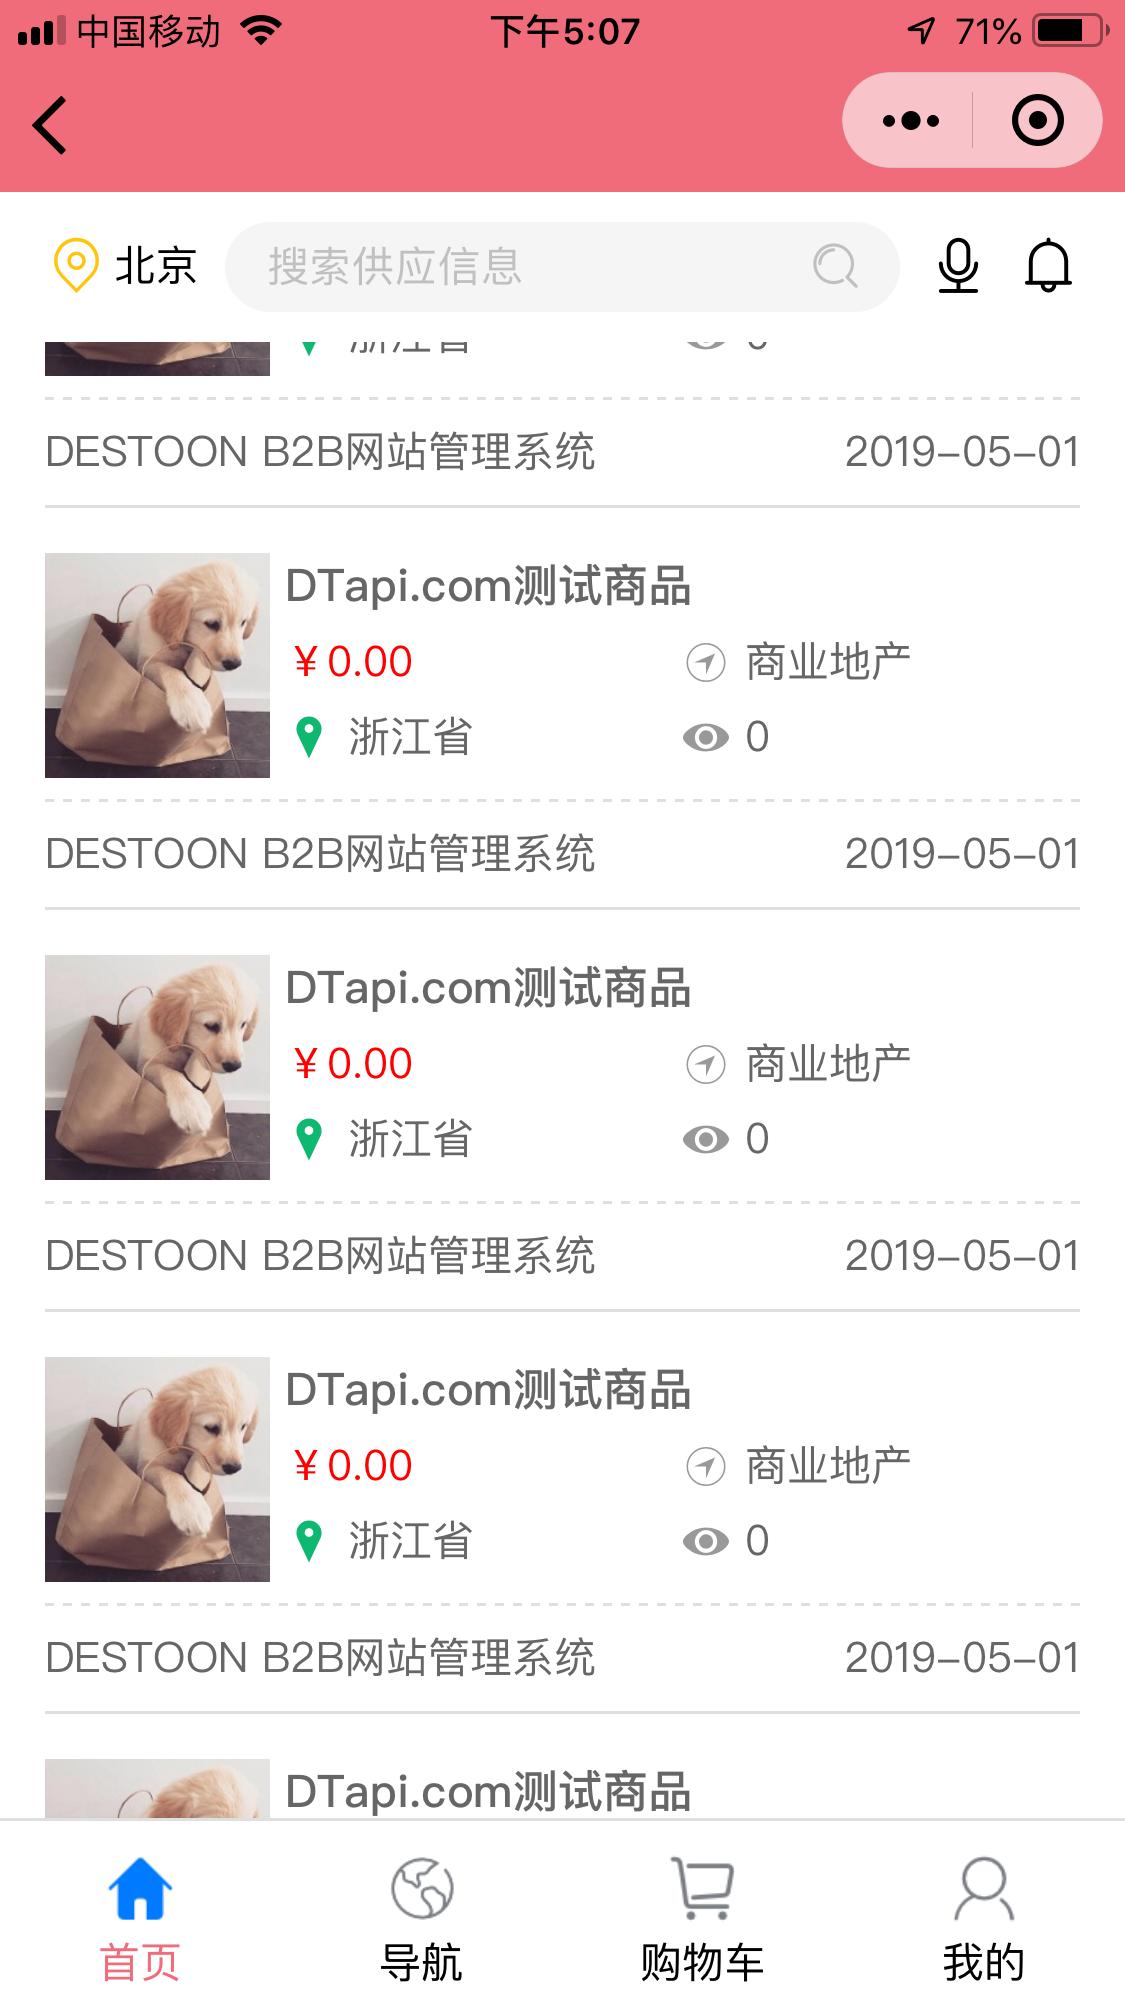 DTapi app 基础版 destoon 原生app,destoon小程序